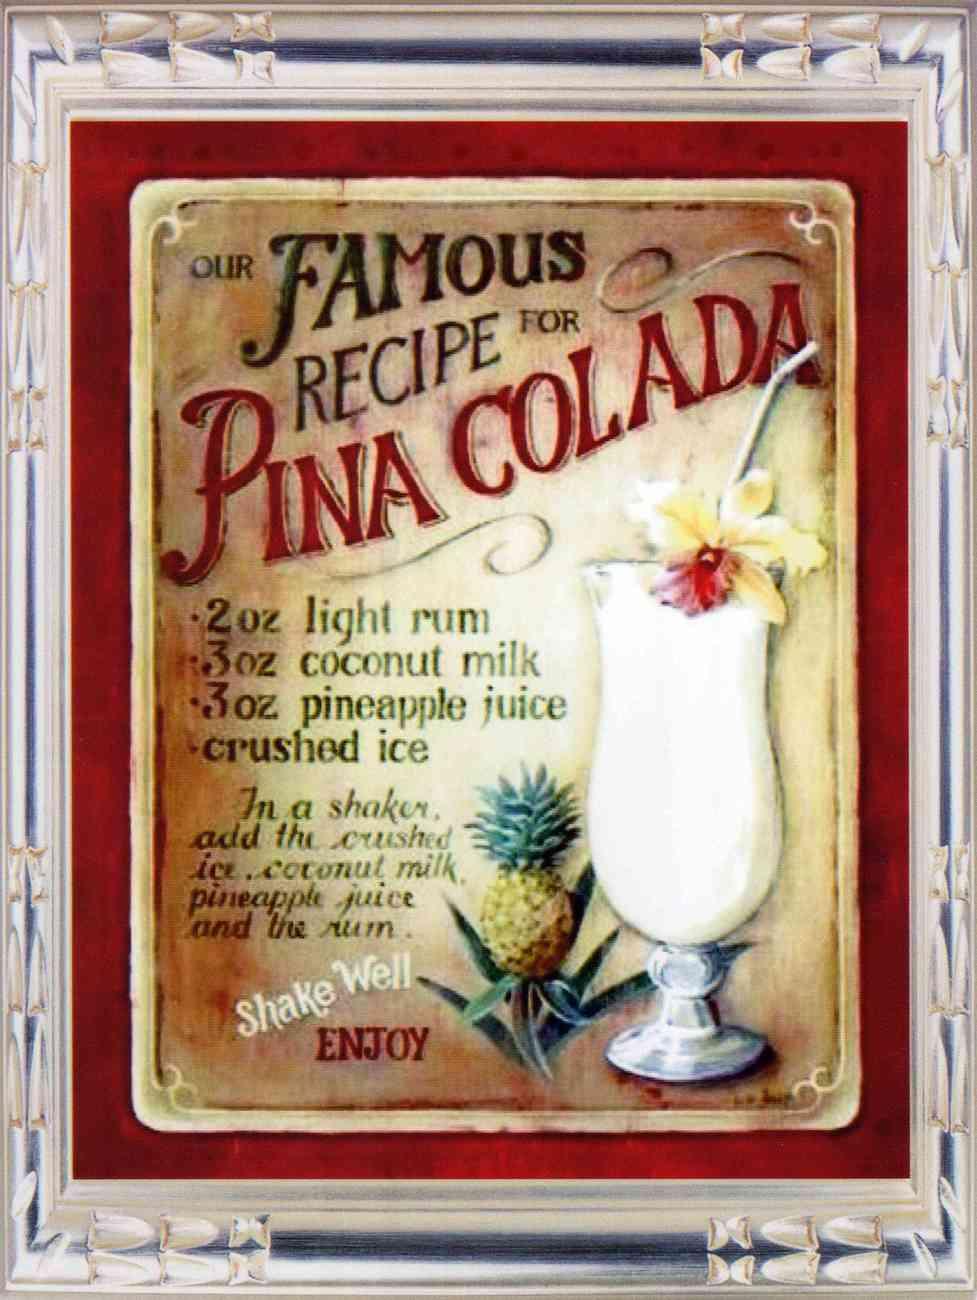 Cocktails pina colada 03